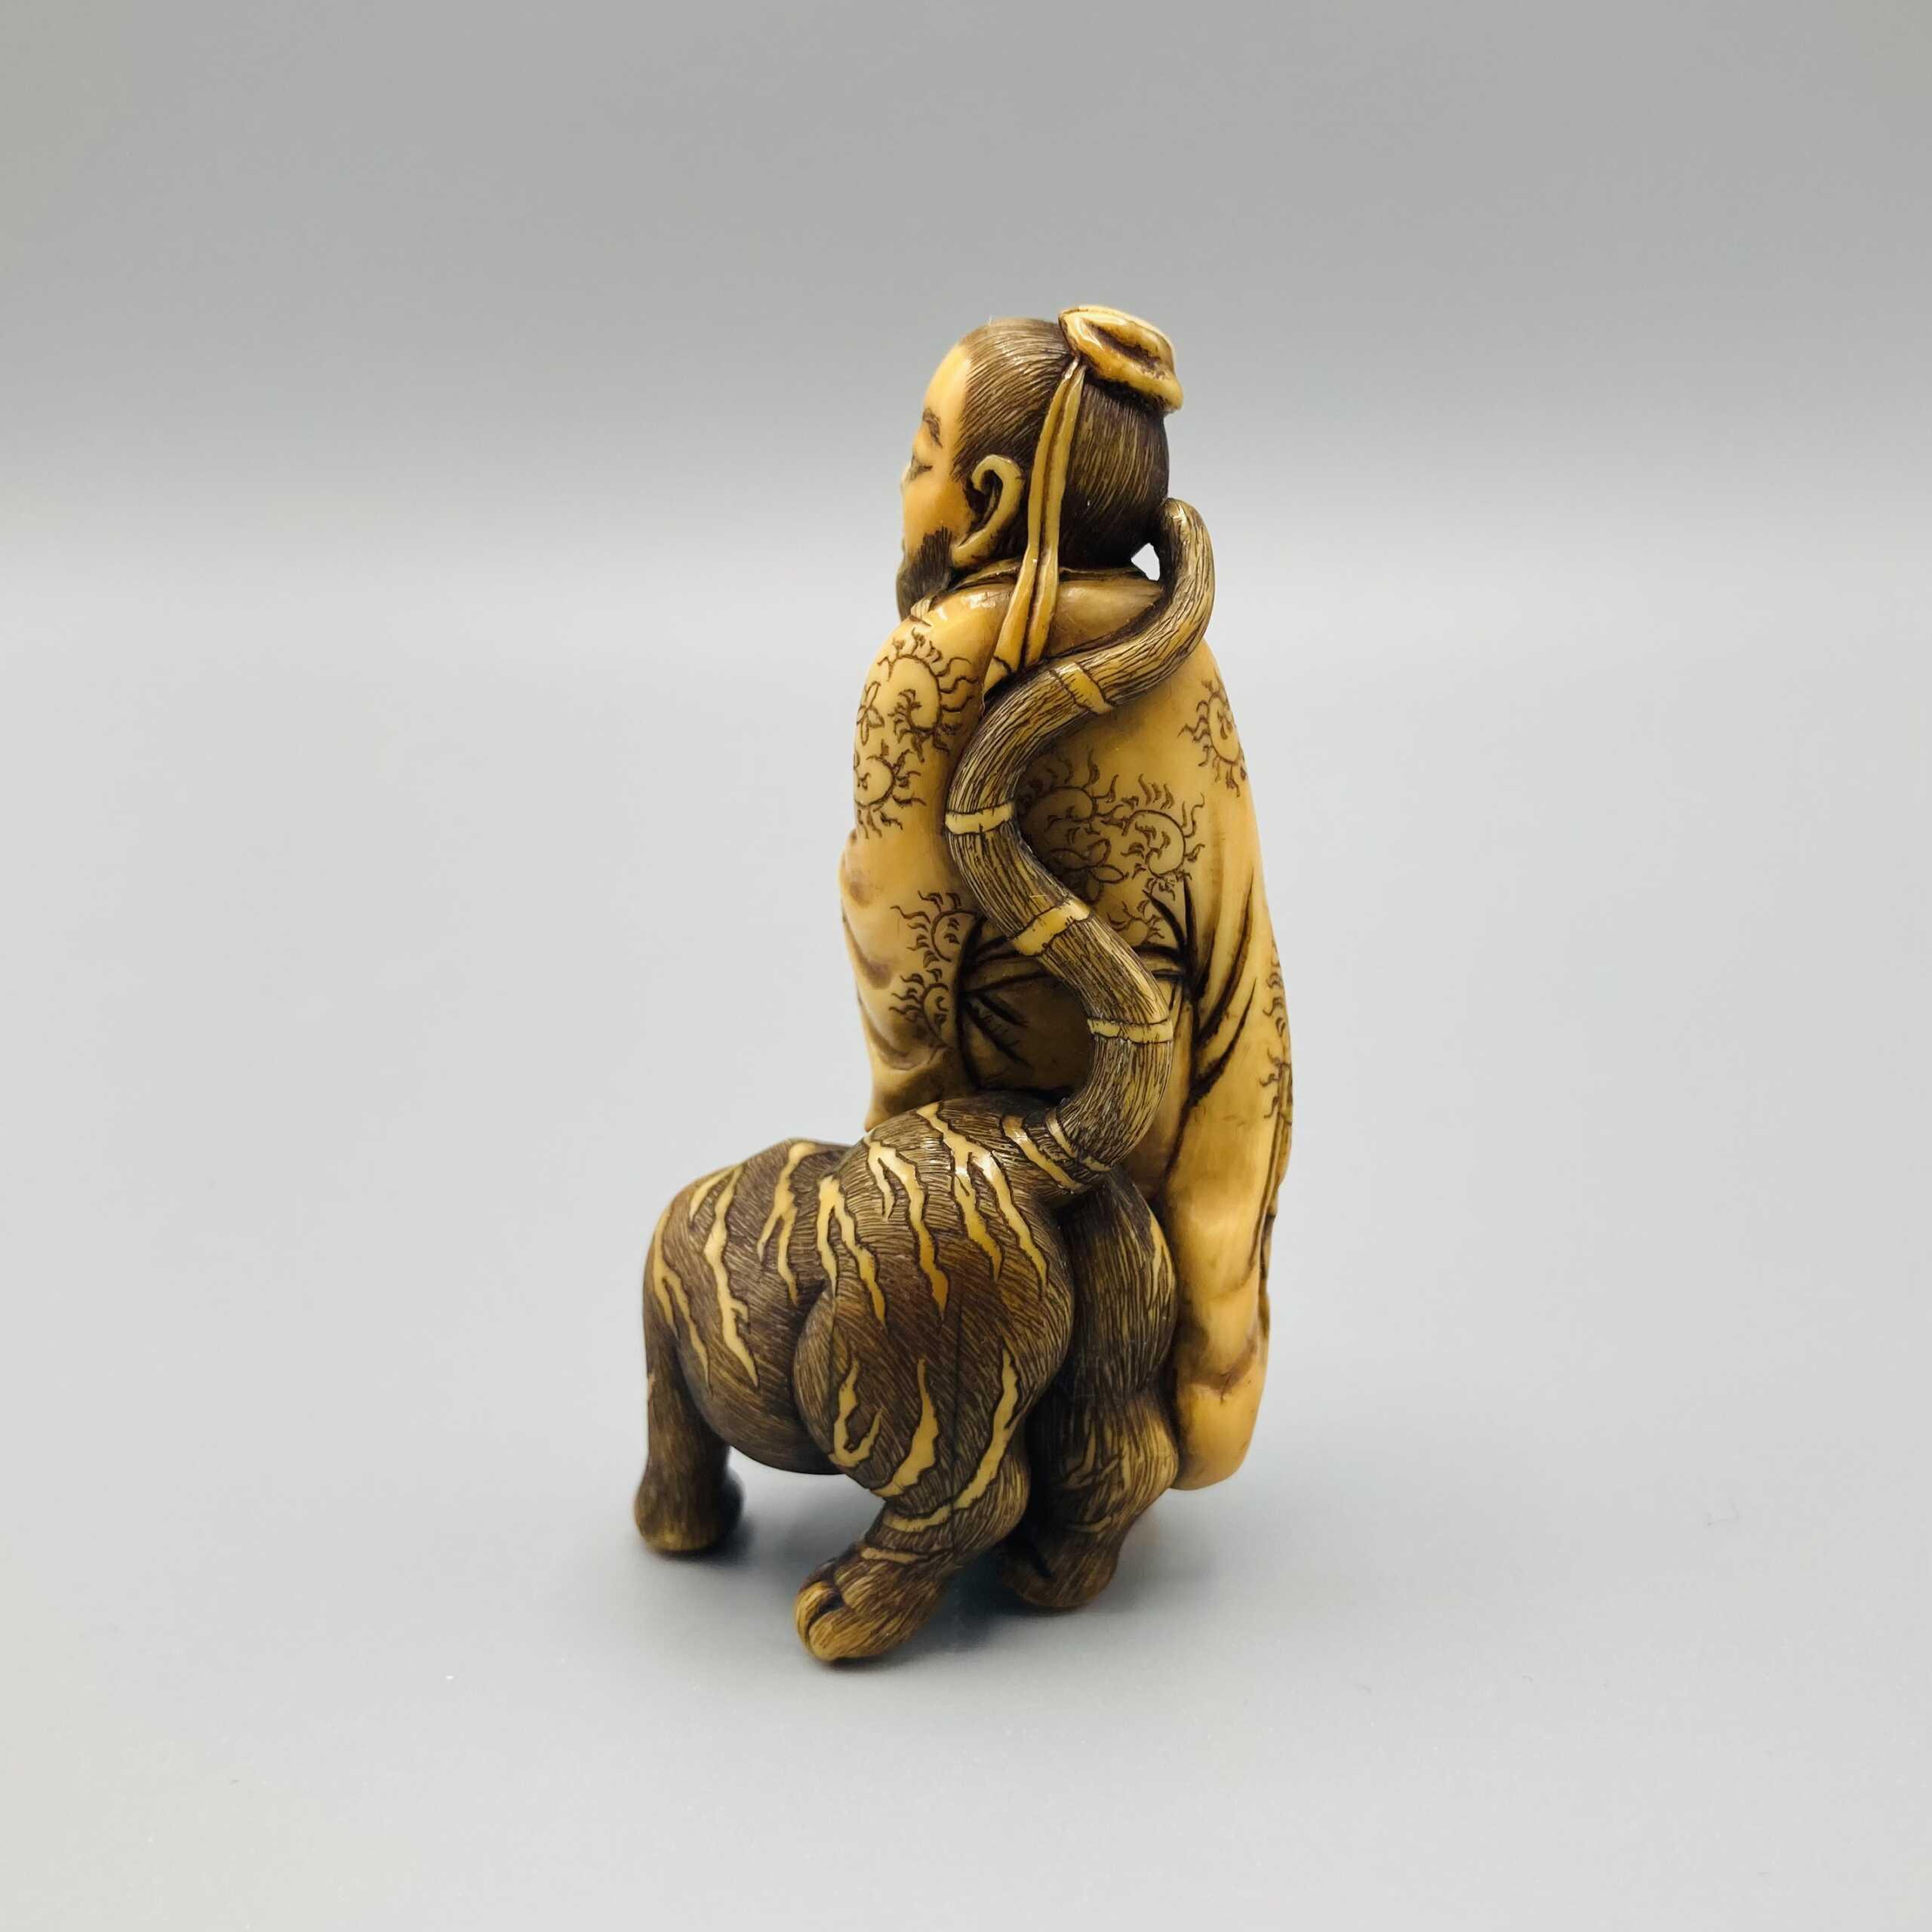 Osaka ivory Shoriken netsuke 5